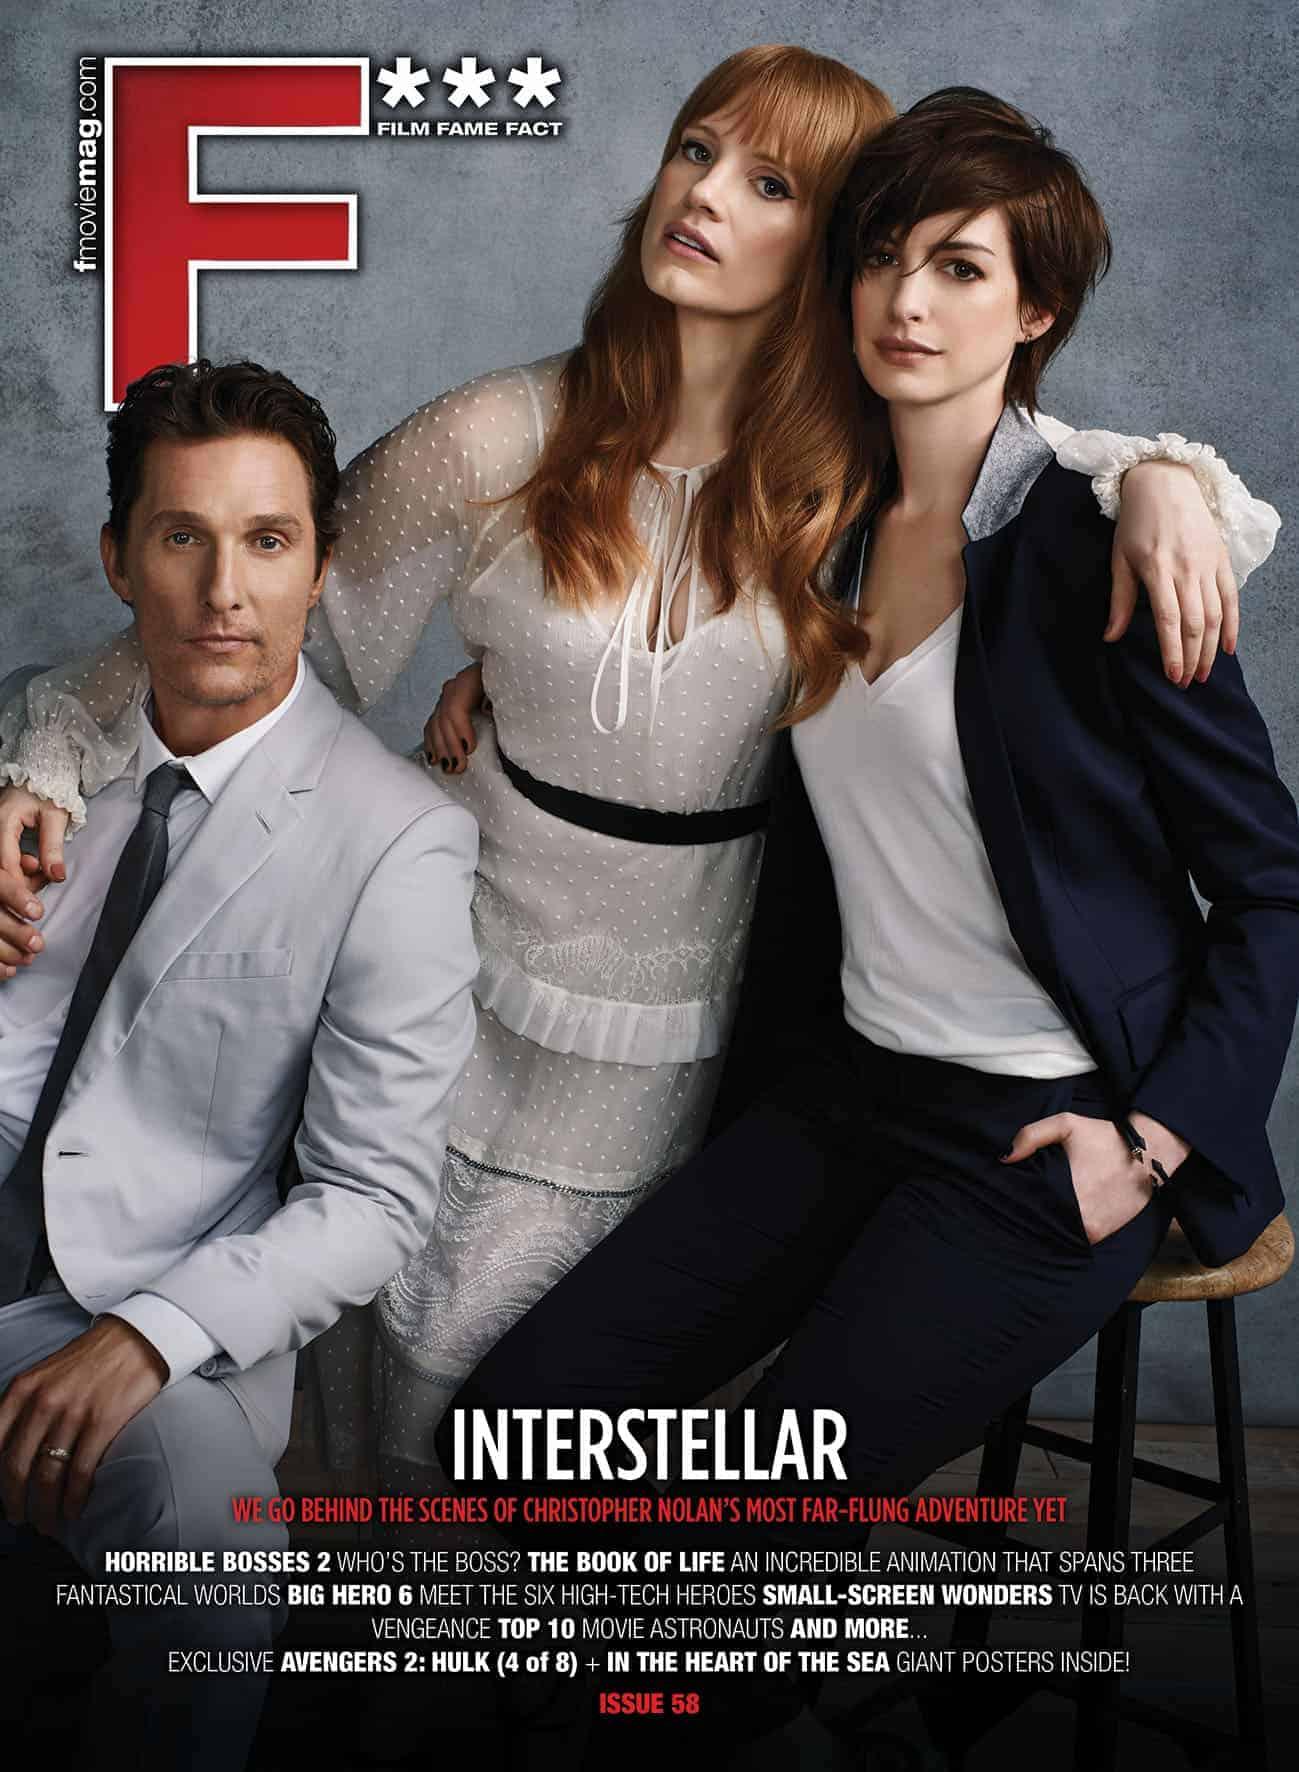 #58 (Nov 2014) Matthew McConaughey, Jessica Chastain and Anne Hathaway cover F*** Magazine's INTERSTELLAR issue